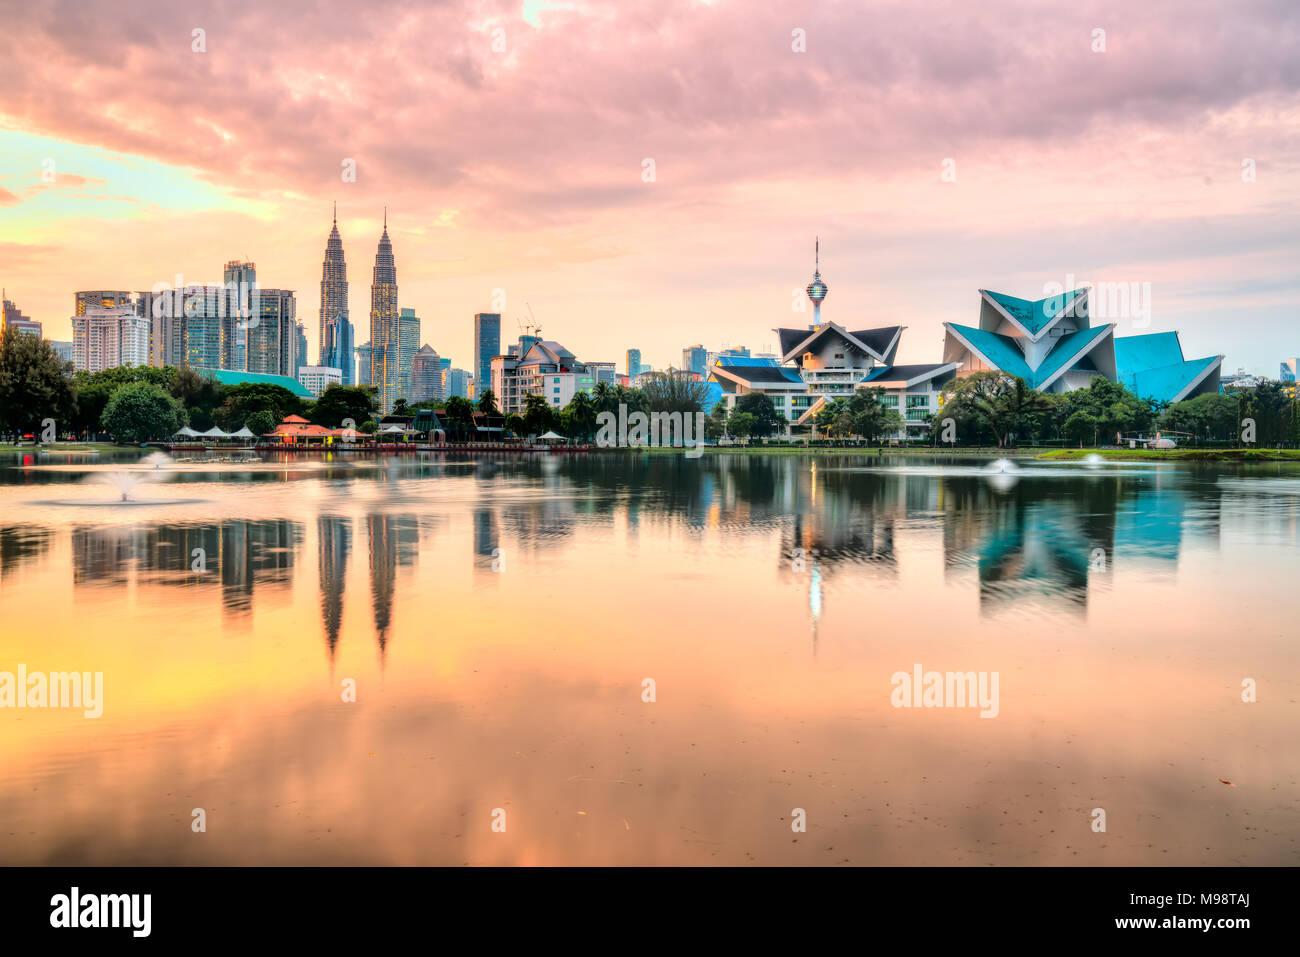 Kuala Lumpur, Malesia. Skyline tramonto dal Parco Titiwangsa. Immagini Stock